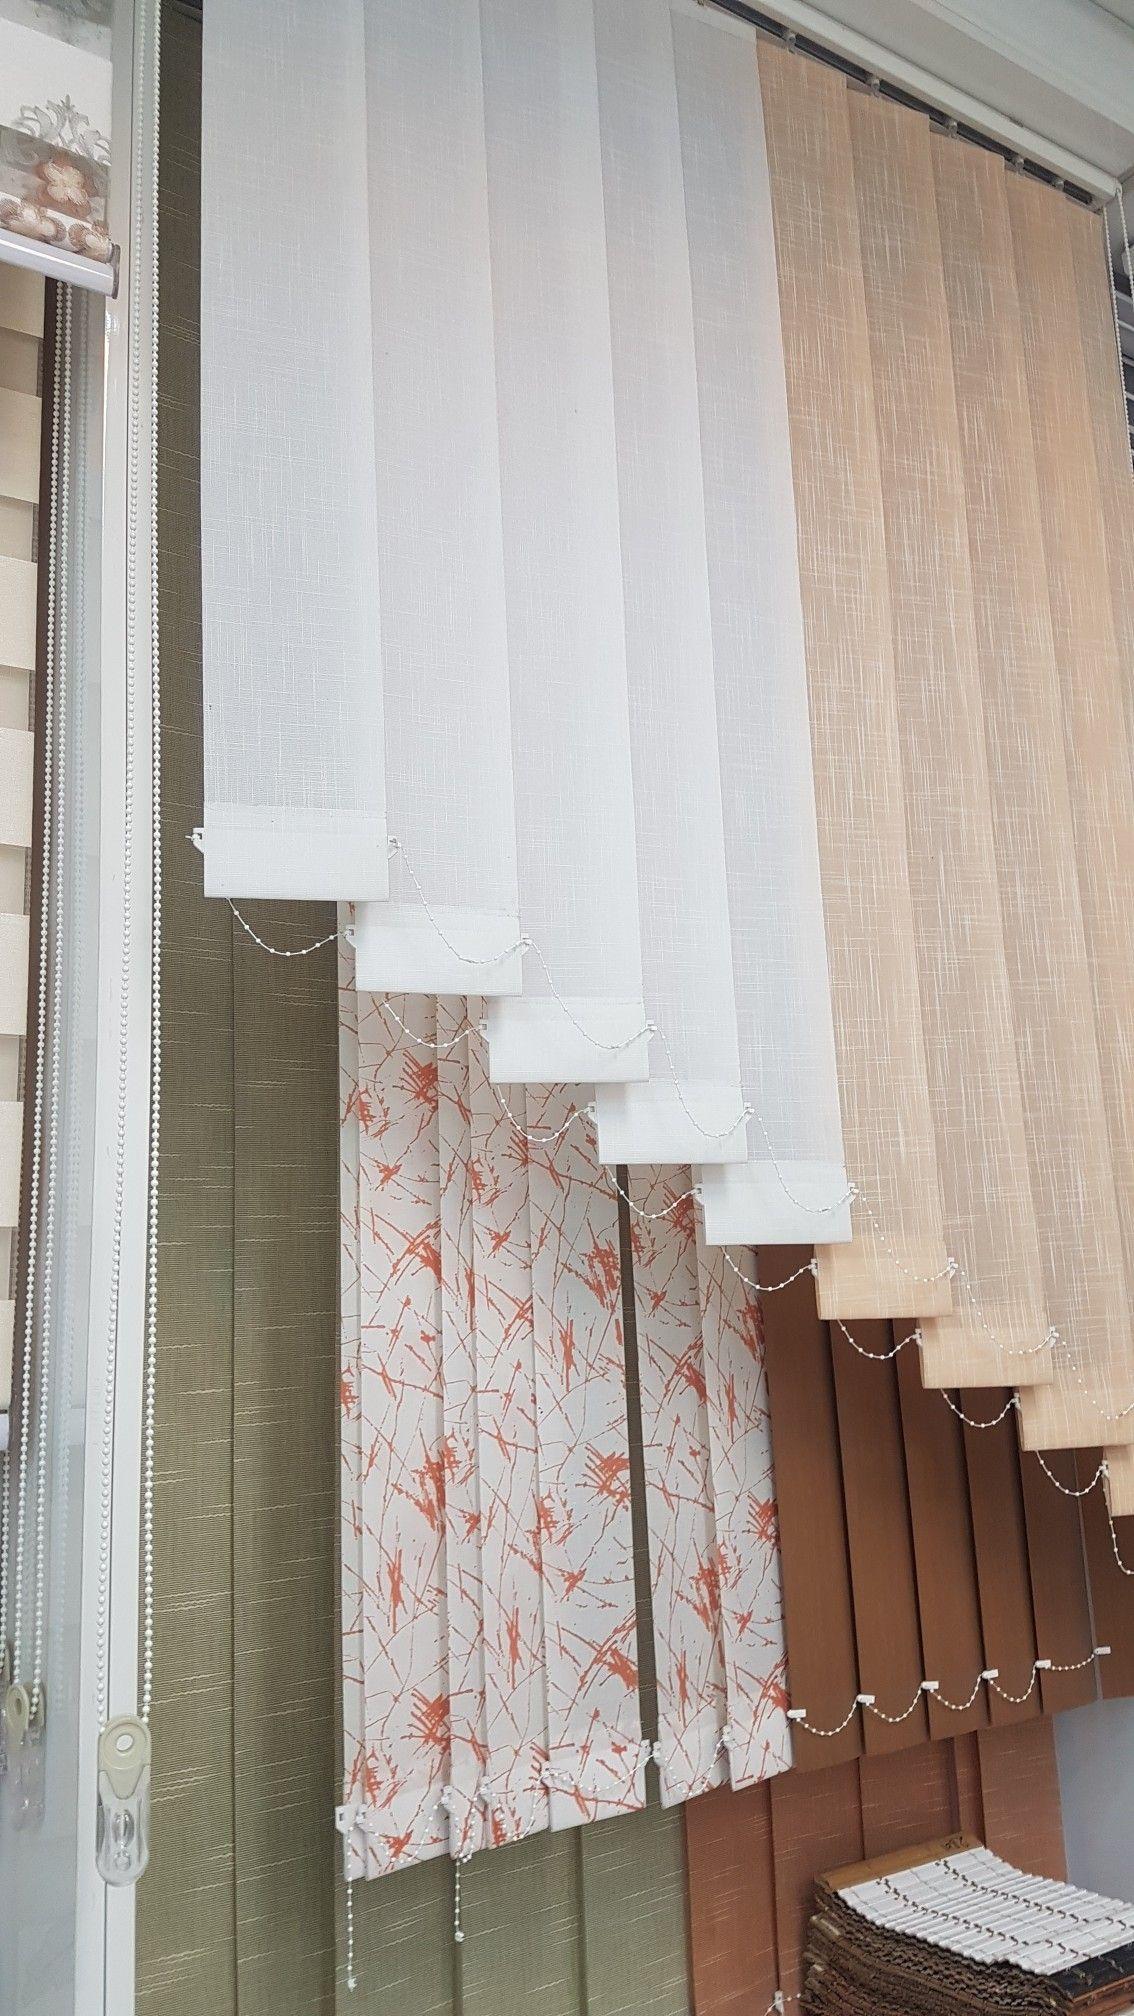 Curtains برادي داخلية ستائر تنفيذ تركيب برادي للاستفسار او واتس اب 0096171170181 Curtains And Other Salon Home Designs Ide Decor Home Decor Roman Shade Curtain